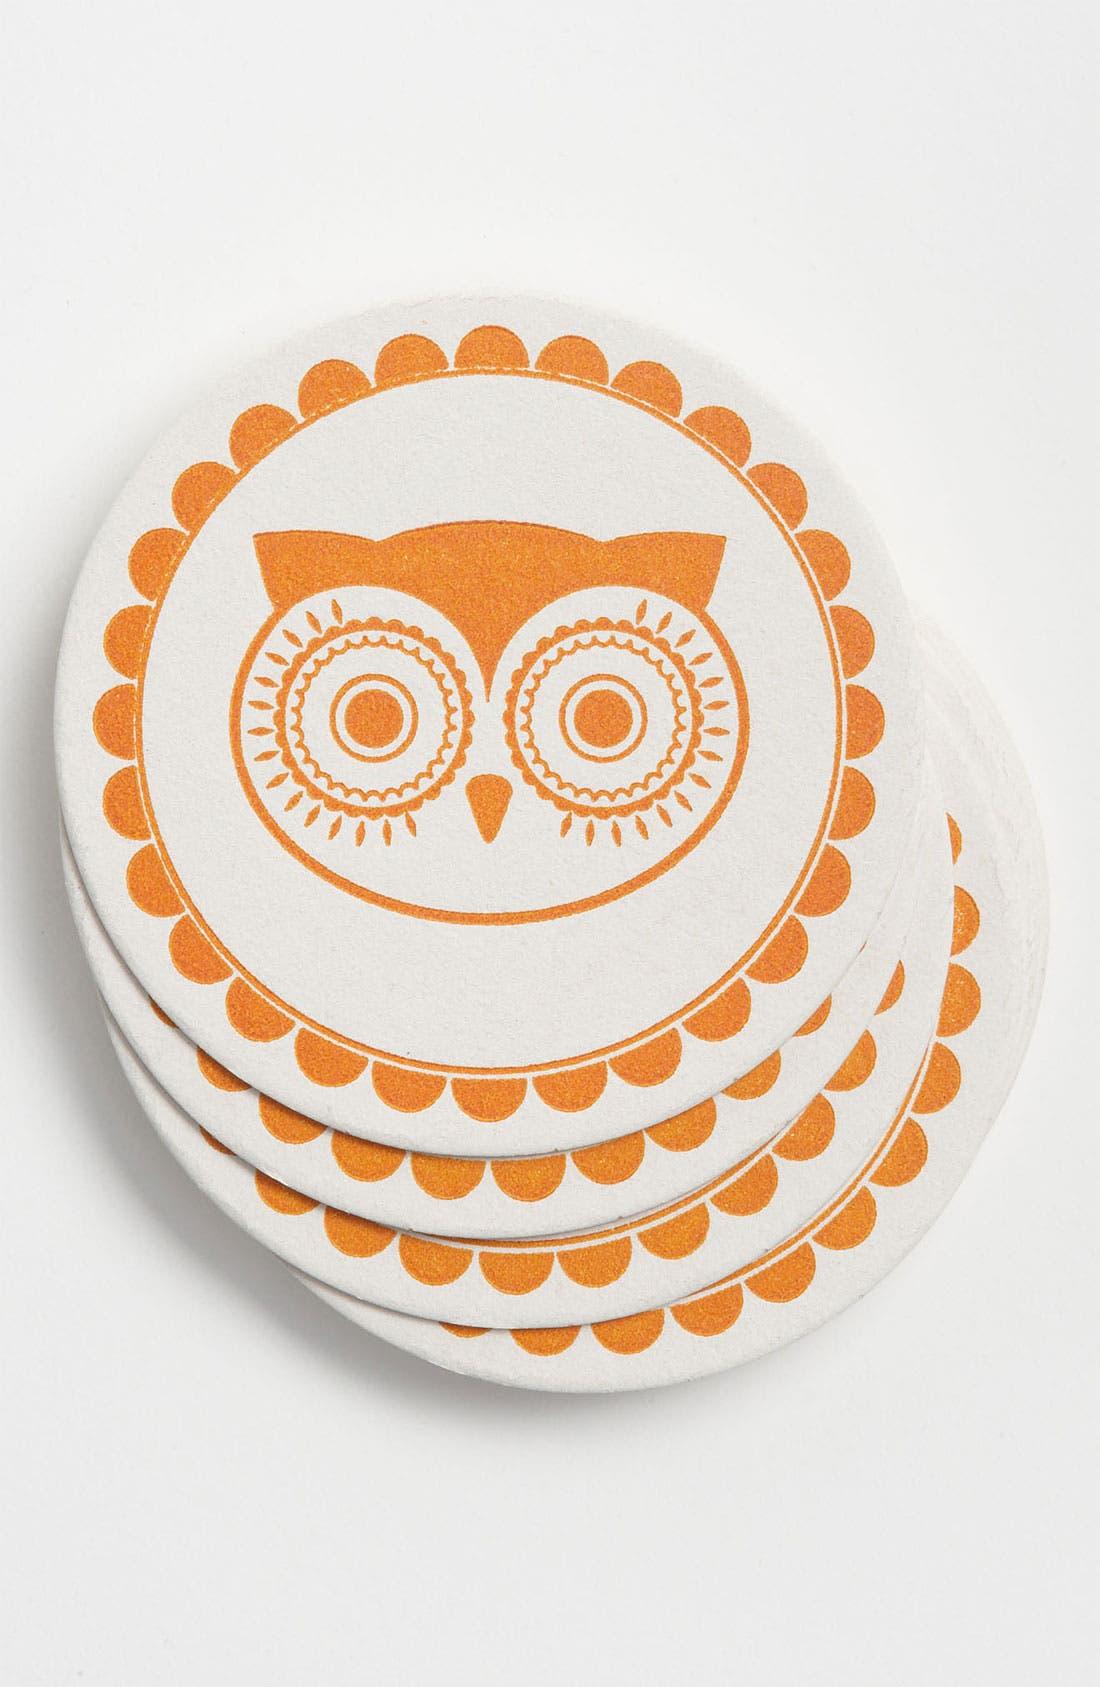 Main Image - 'Vintage Owl' Coasters (Set of 10)